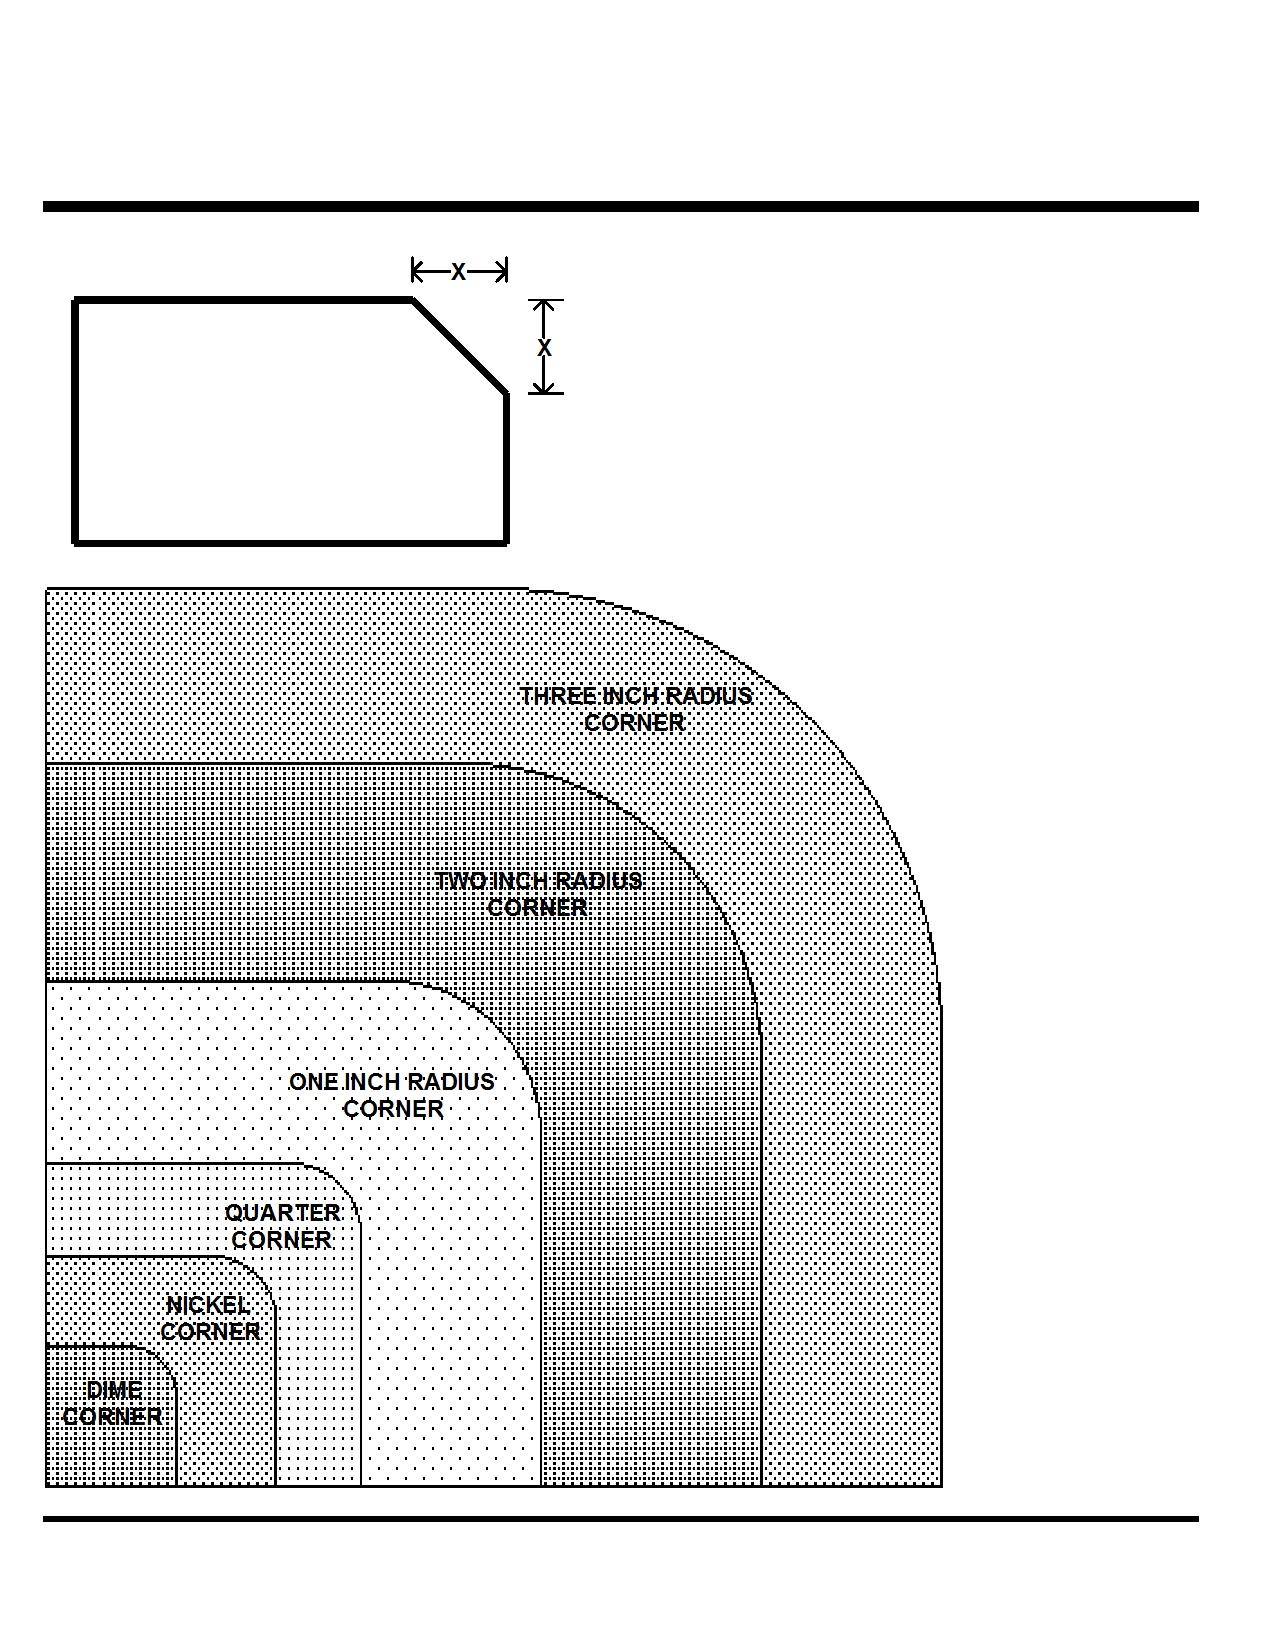 radius corner with labels